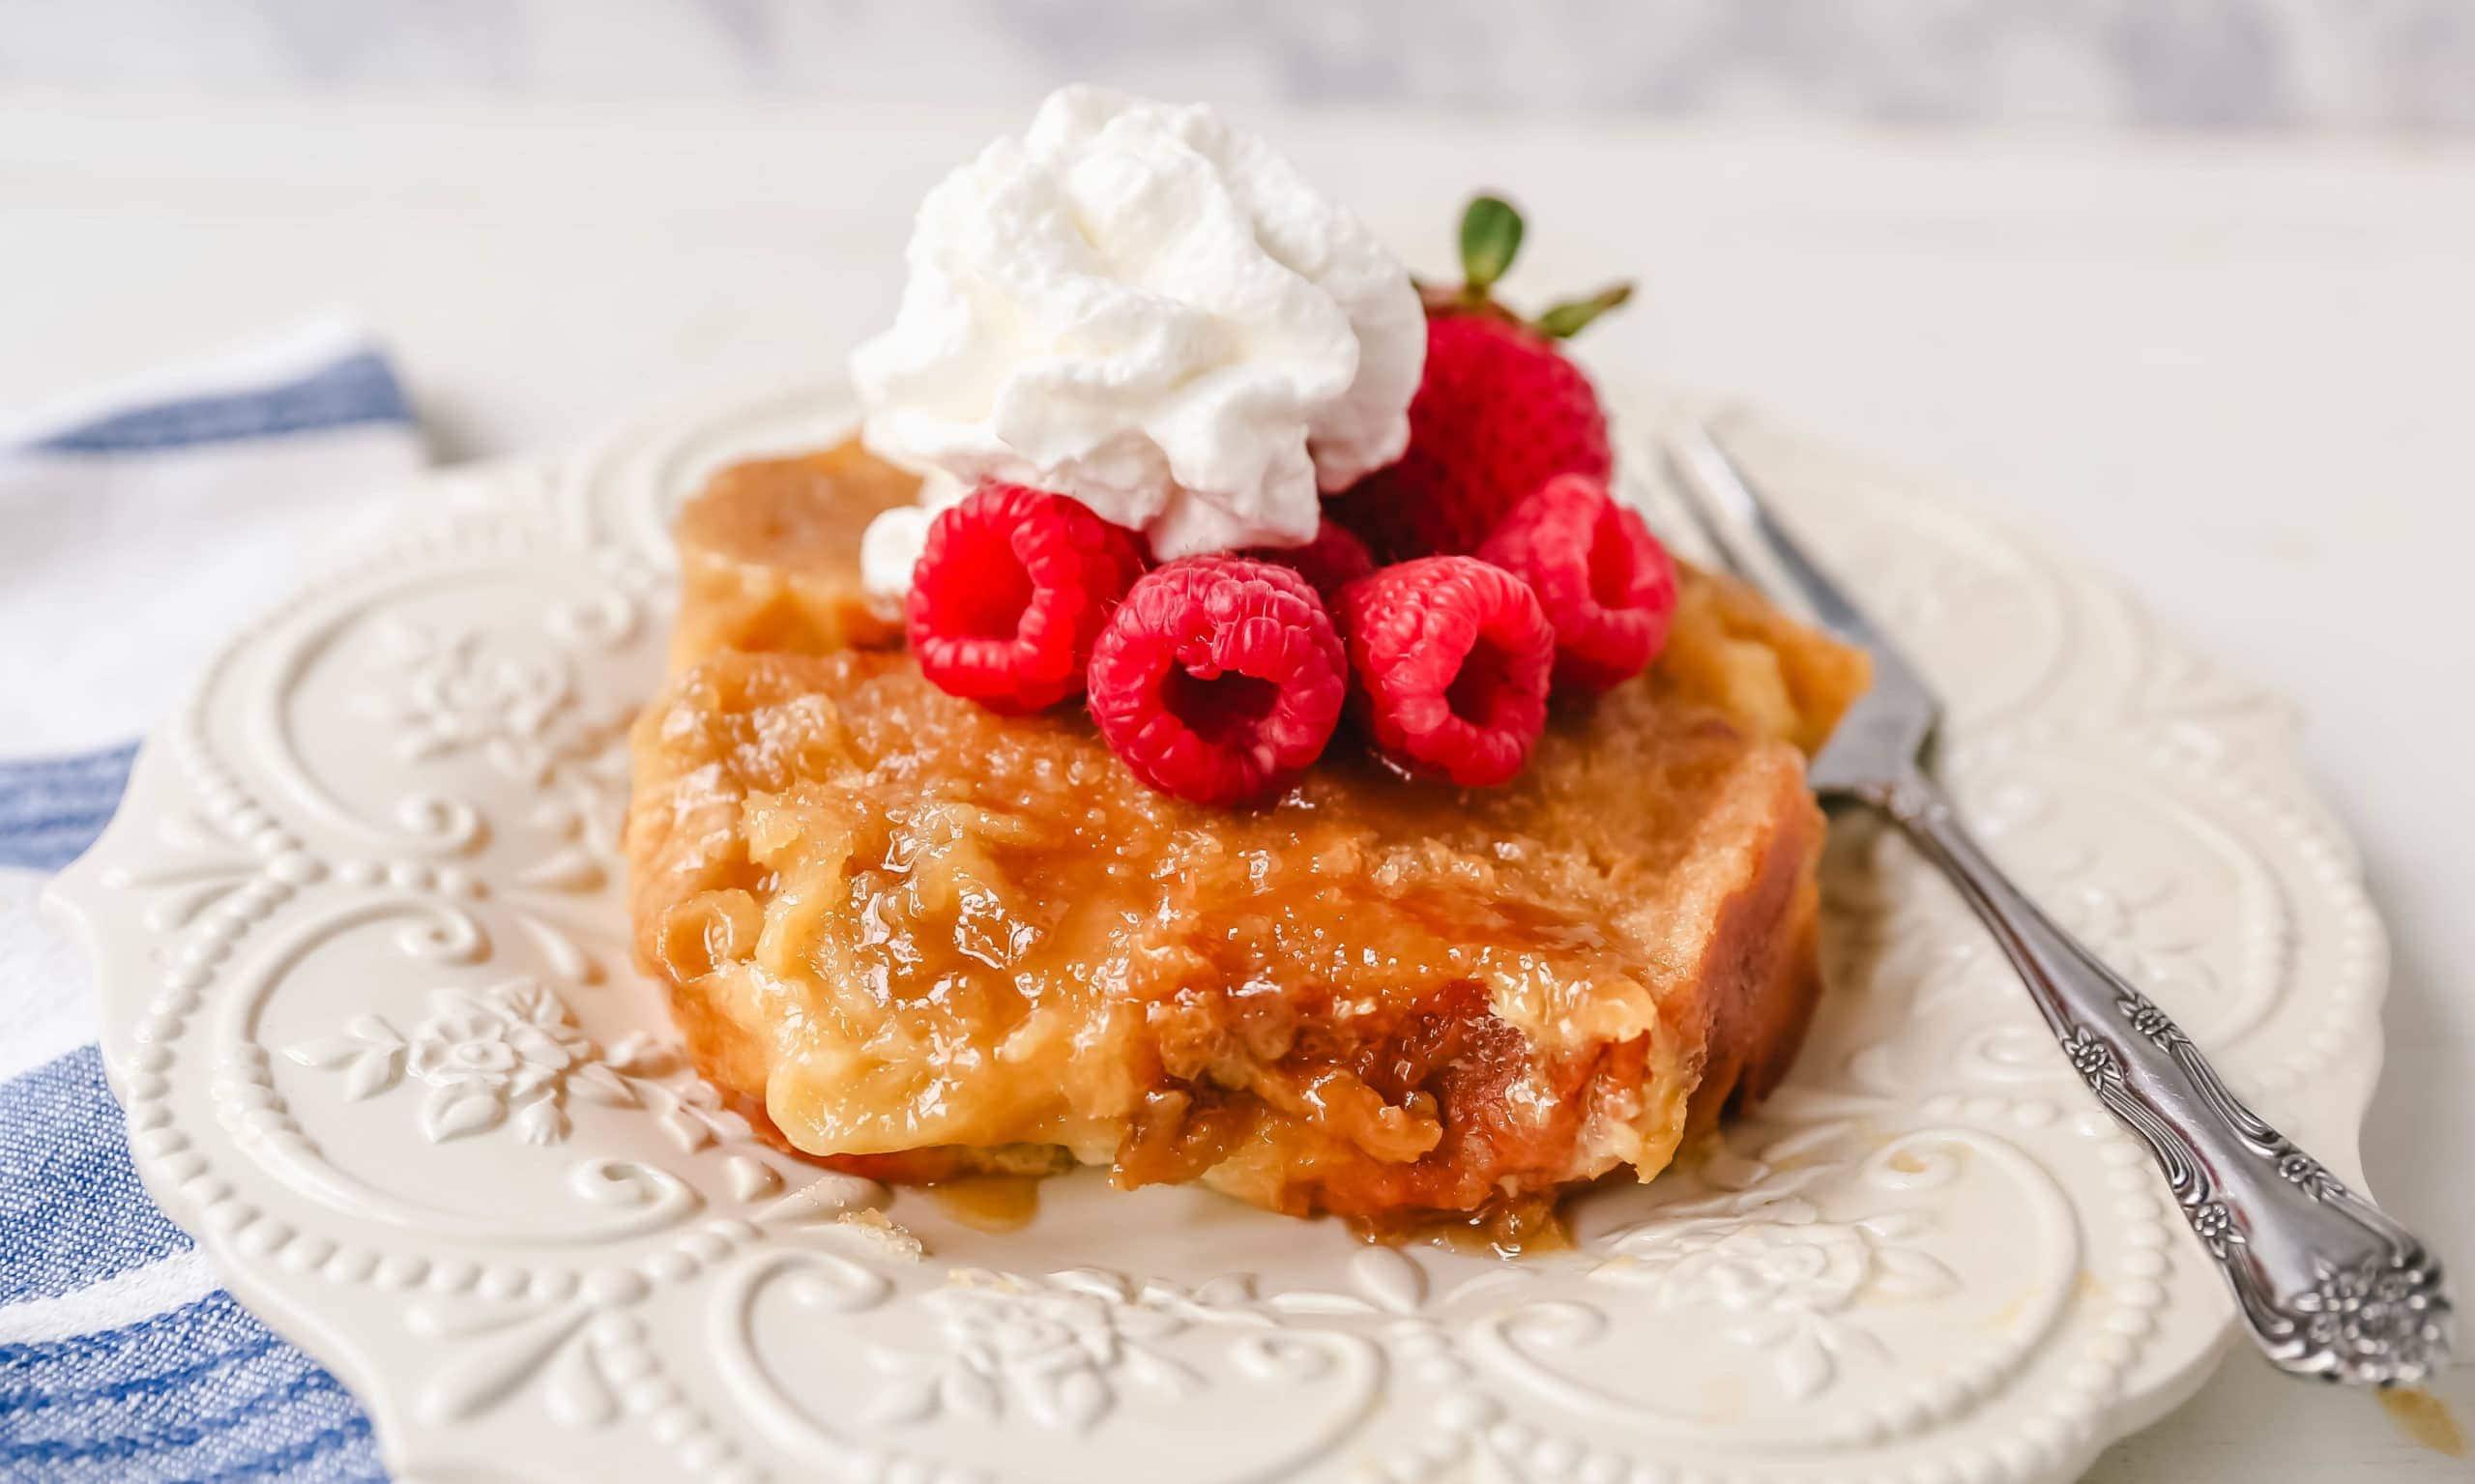 Overnight Creme Brûlée French Toast an easy overnight french toast with thick bread in a buttery sugar glaze and soaked with a sweet custard.www.modernhoney.com #frenchtoast #breakfast #brunch #overnightfrenchtoast